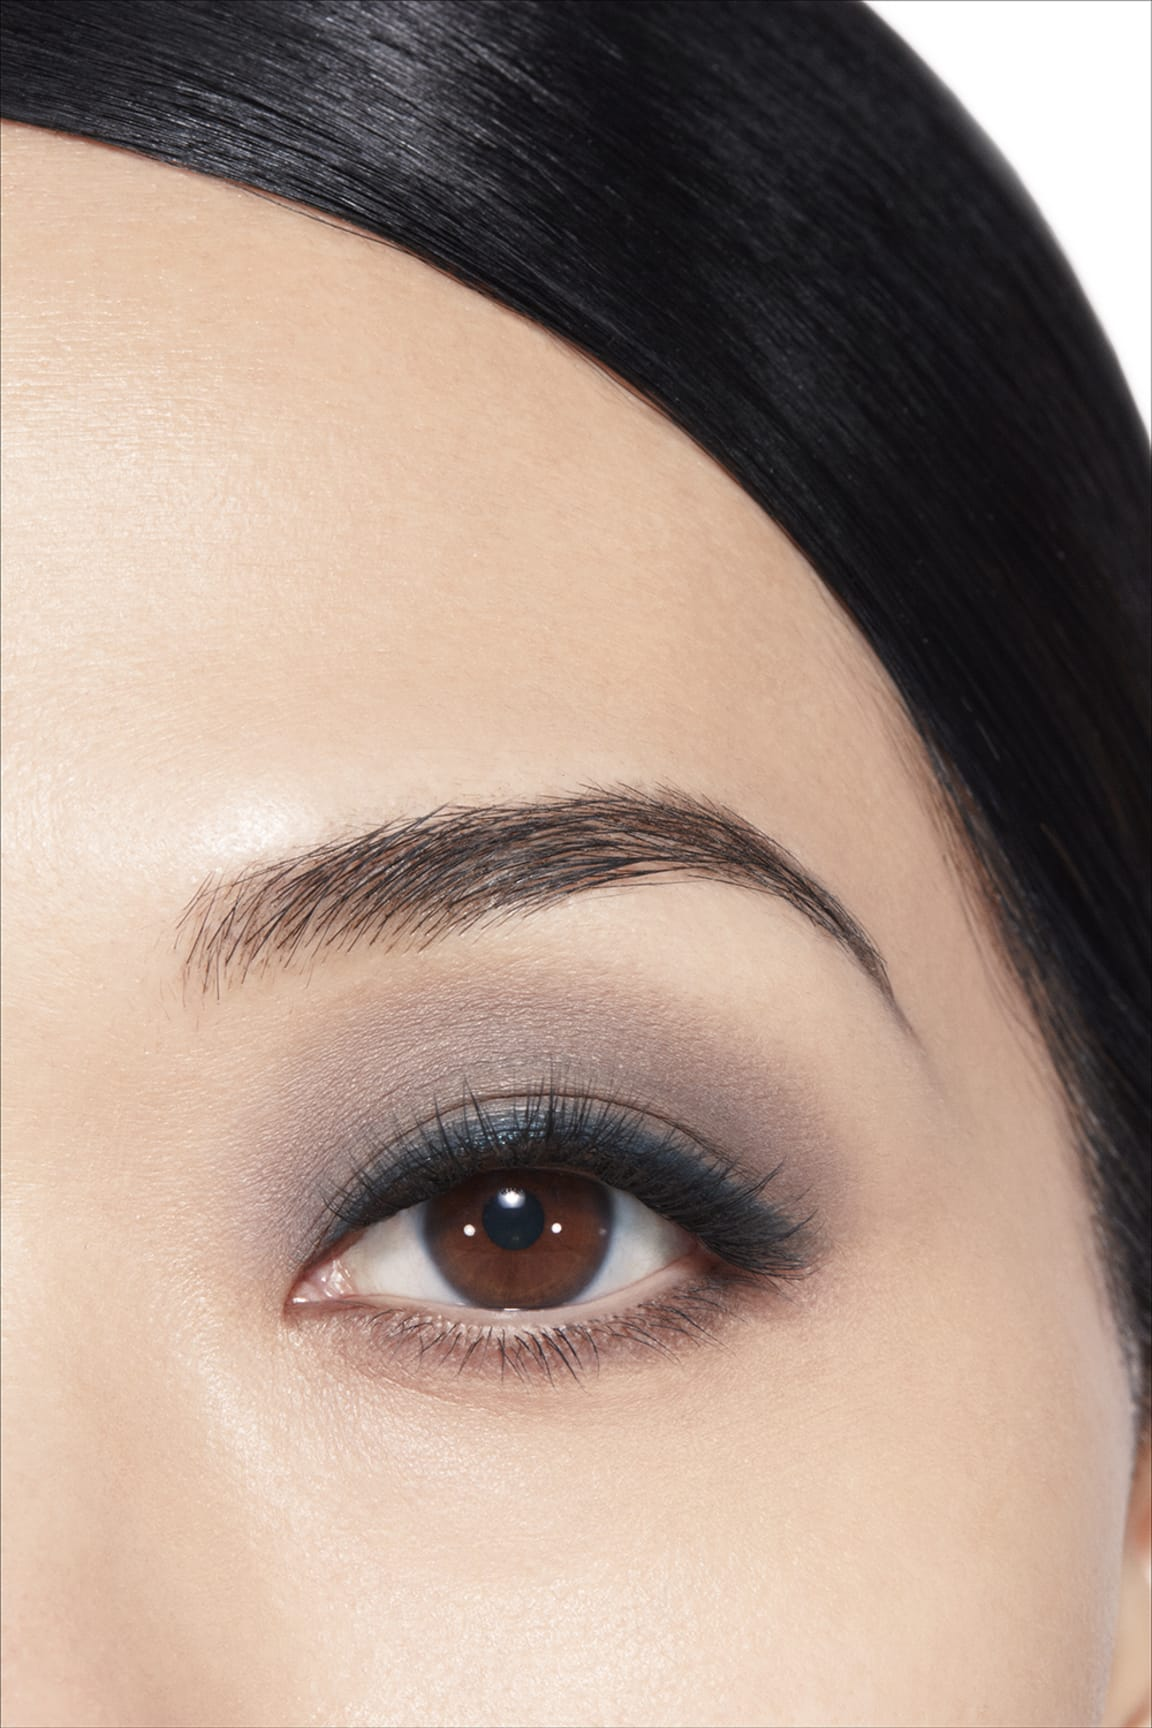 Imagen aplicación de maquillaje 1 - LES 4 OMBRES 324 - BLURRY BLUE